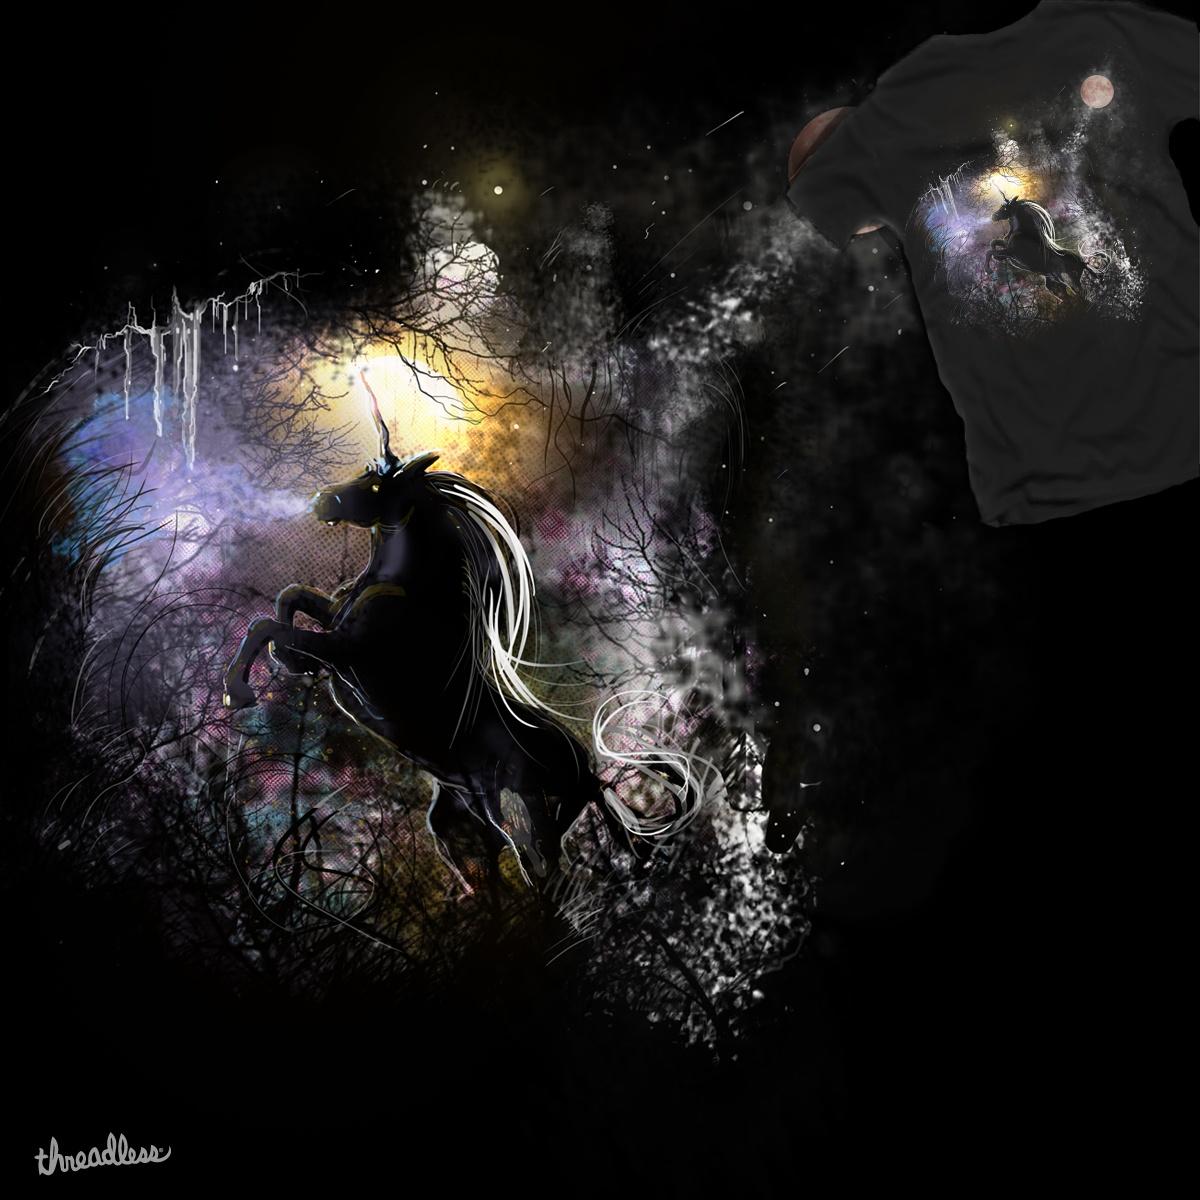 Unicorn of Ice by johnnyspeter on Threadless